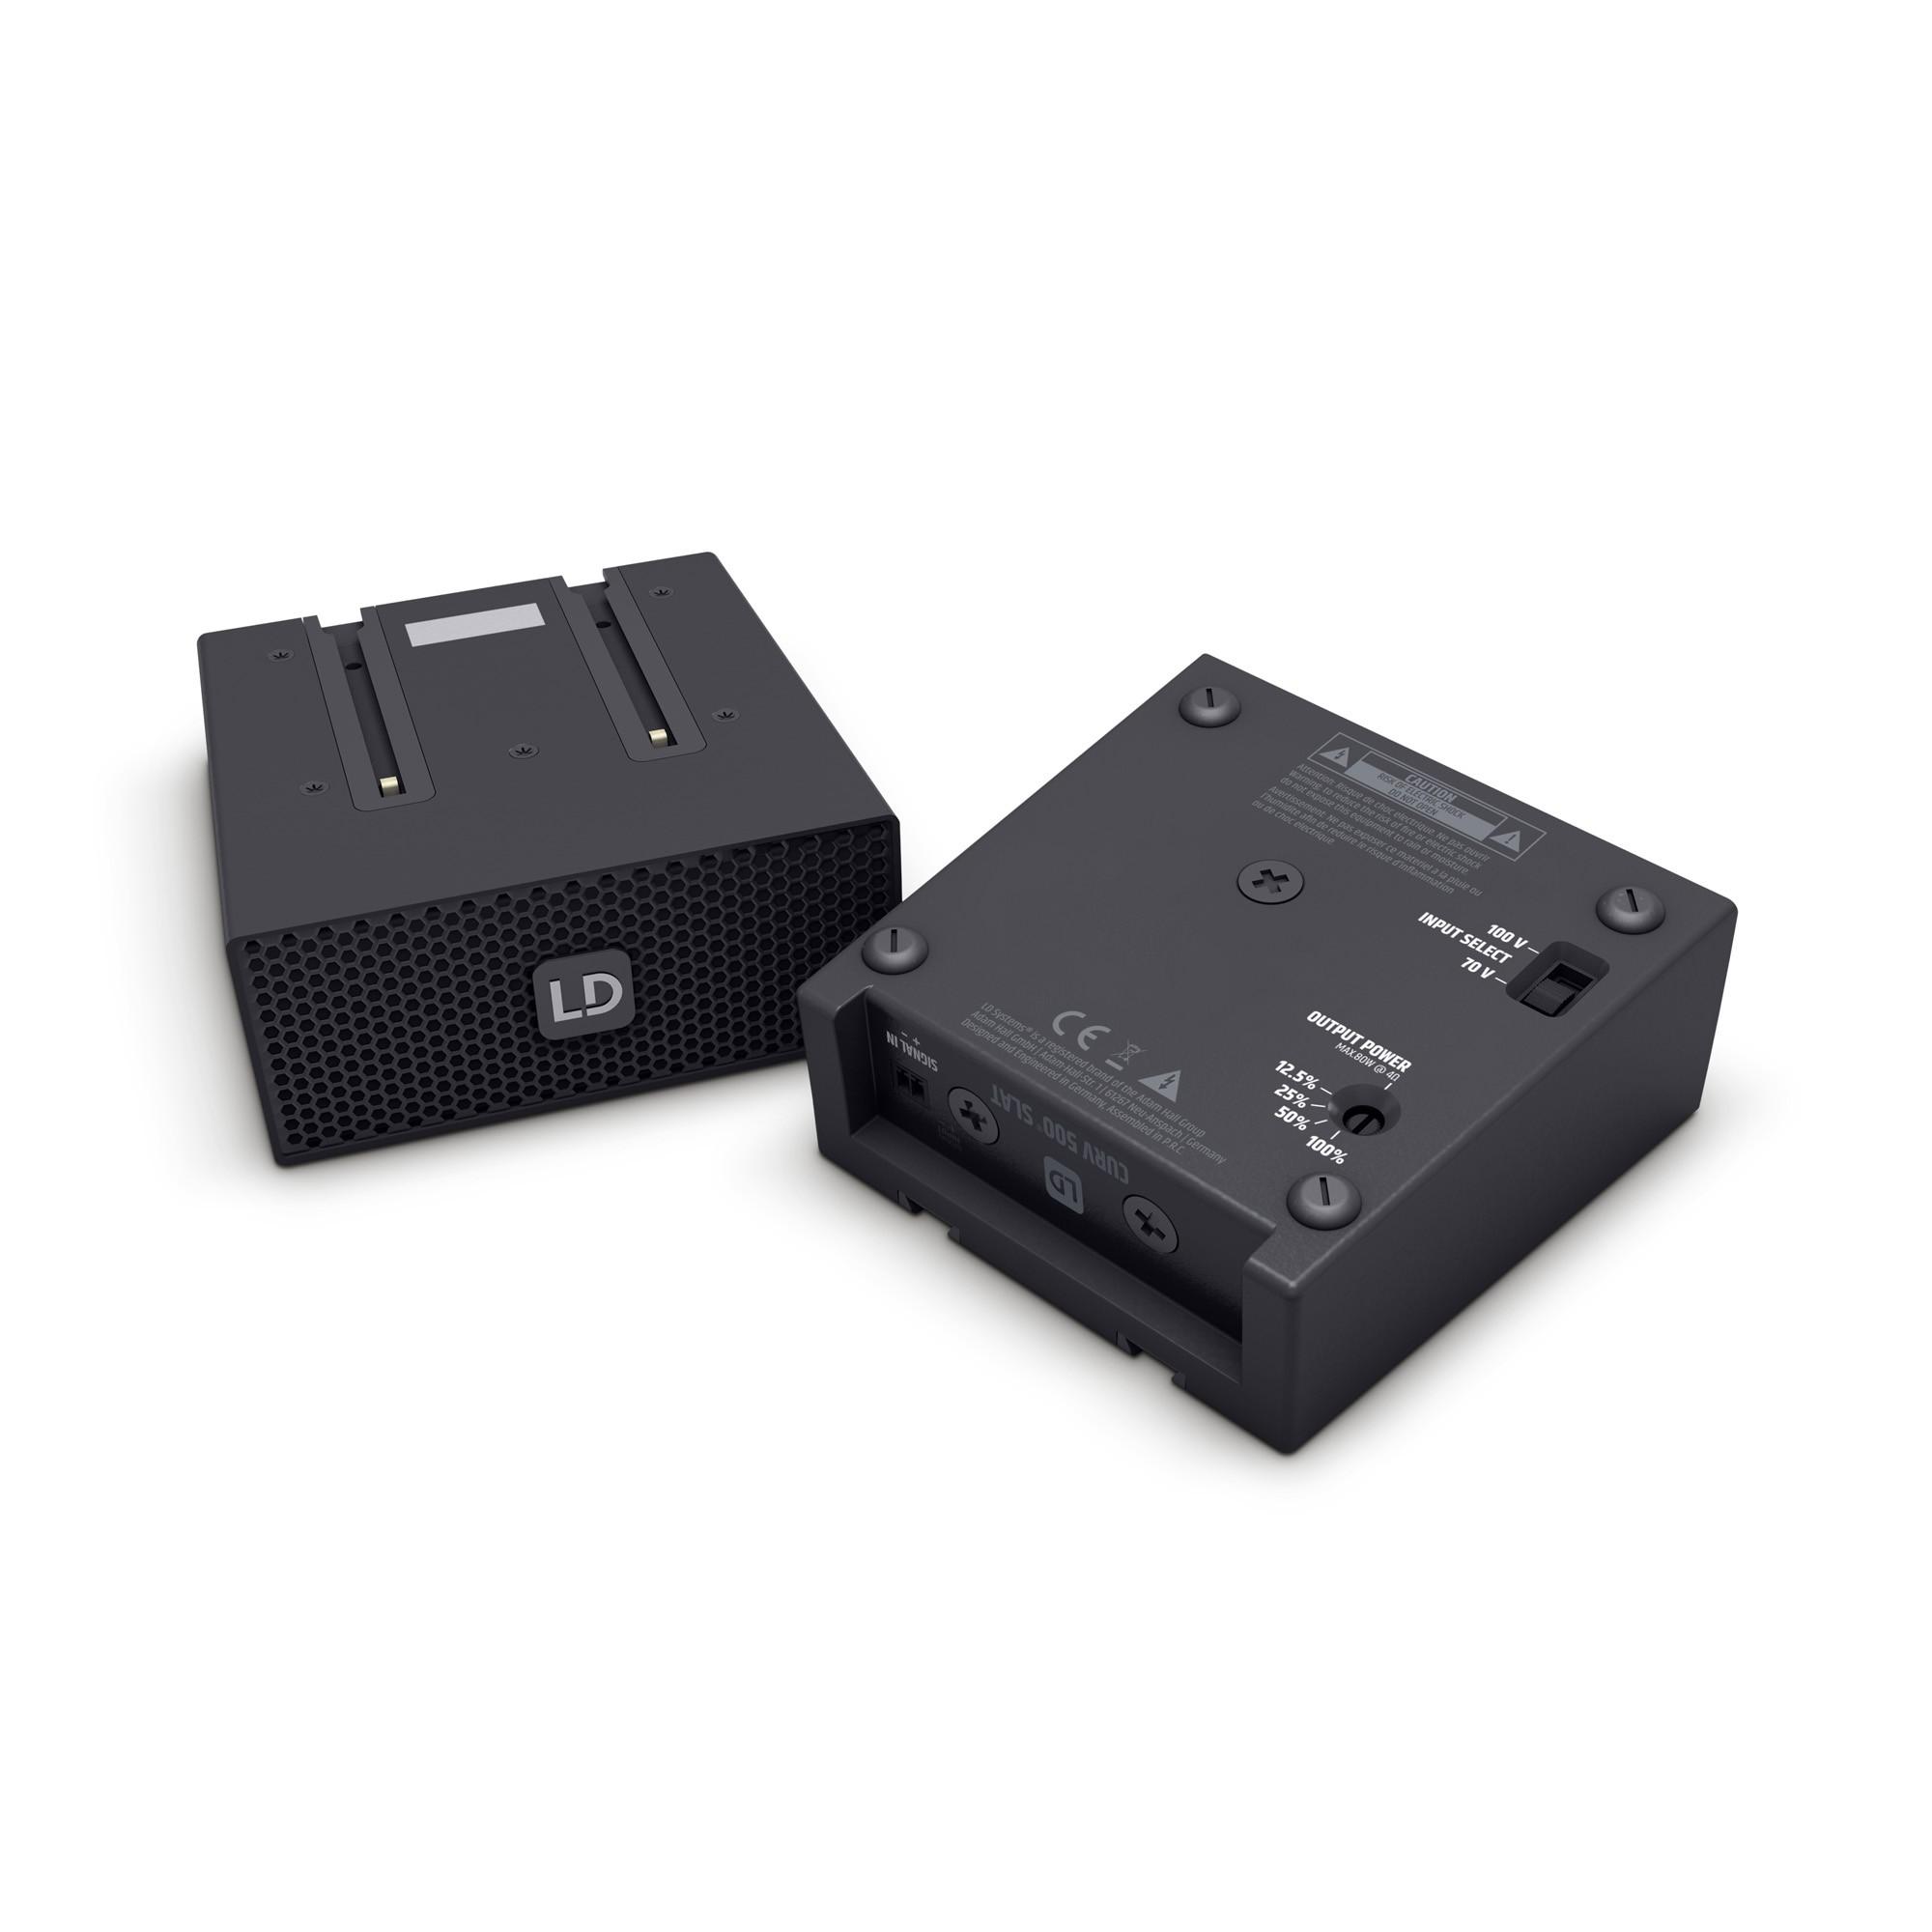 CURV 500 SLAT Curv 500® 70 / 100 Volt SmartLink® Adapter black